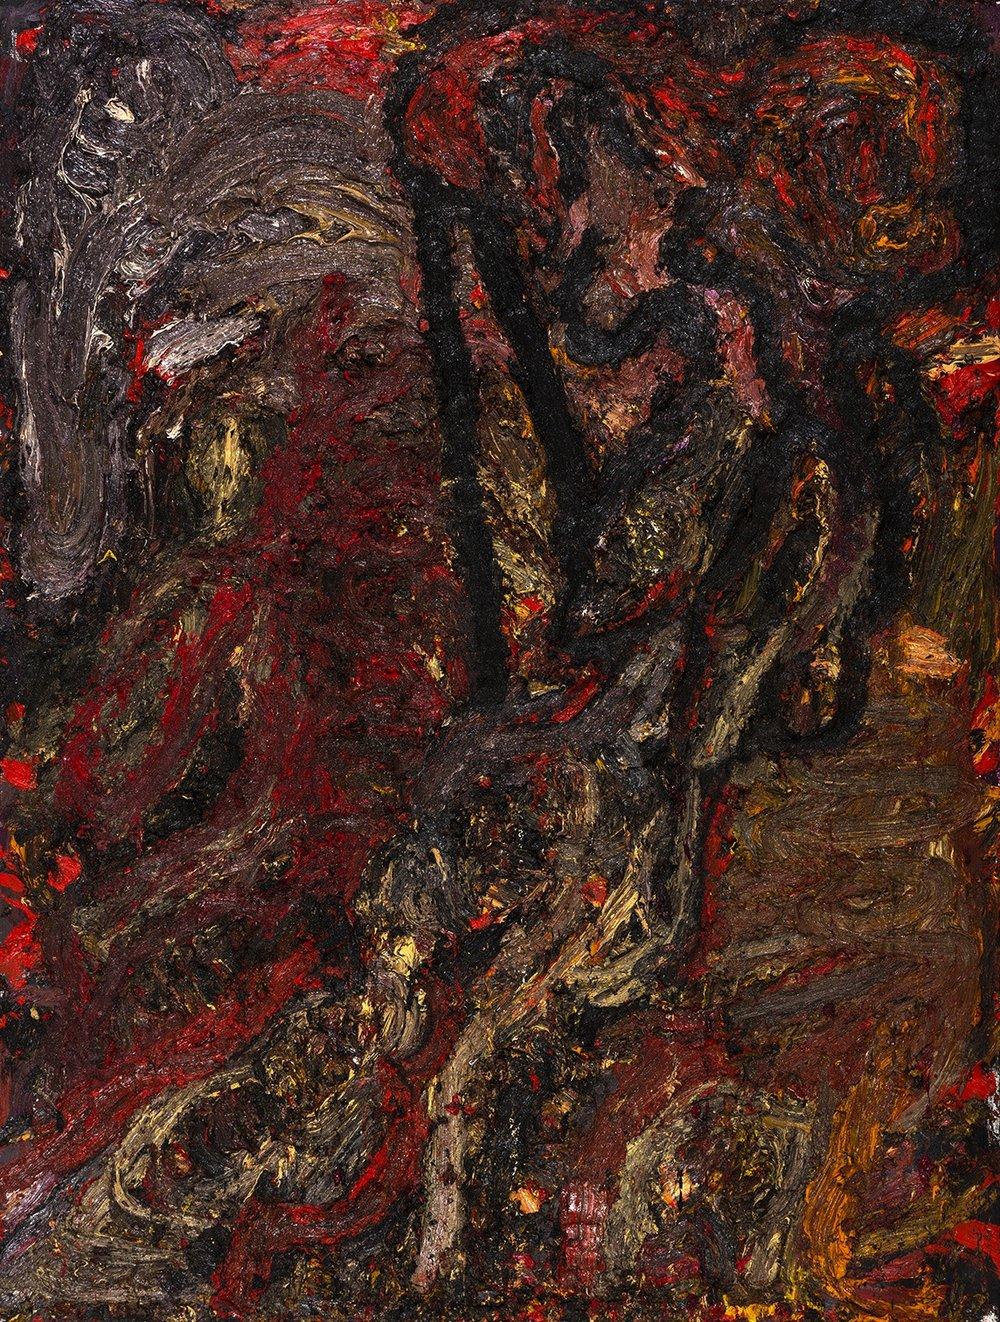 Cyberdemon, 2016 Oil on canvas 280 x 210 cm